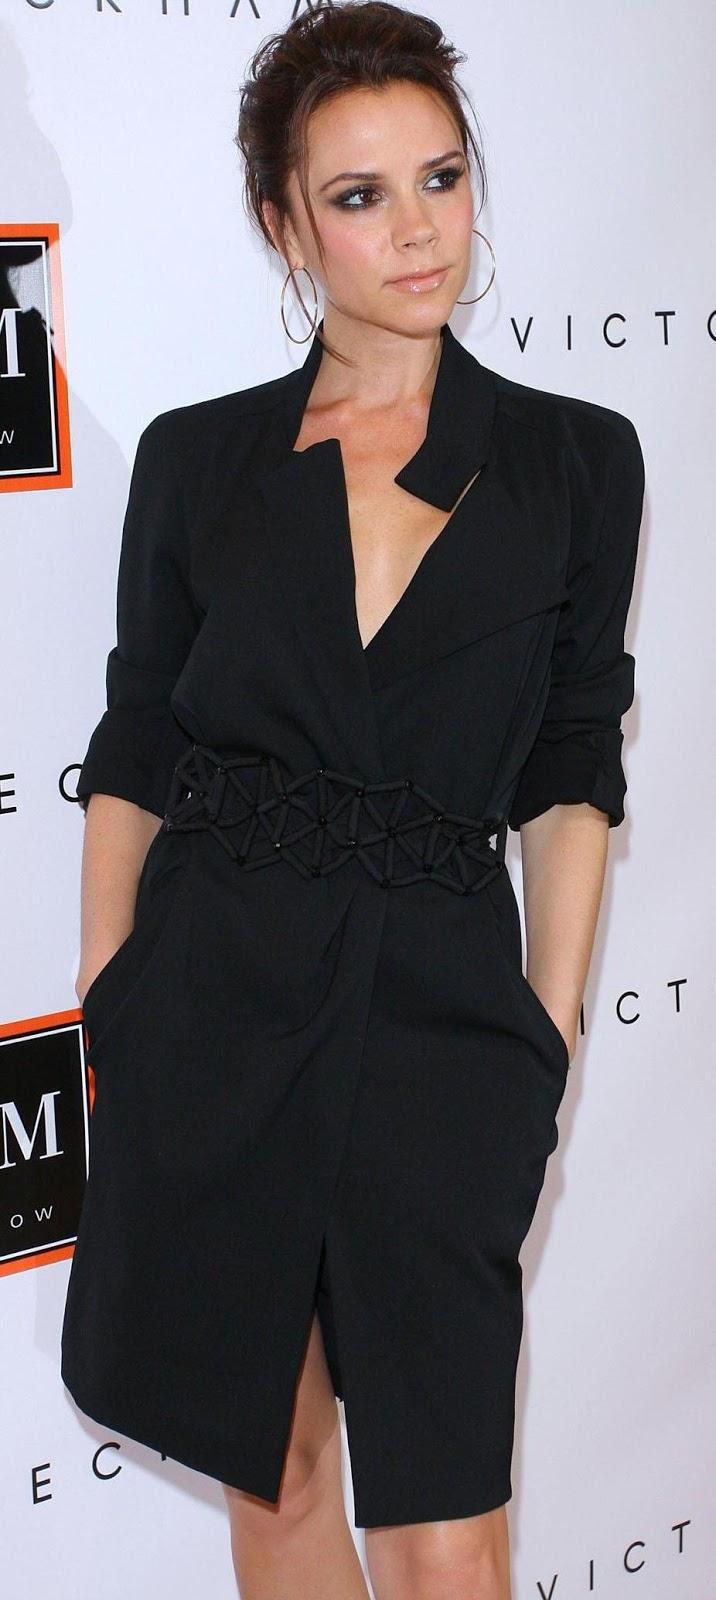 Dresses For Women: Vic... Victoria Beckham Clothing